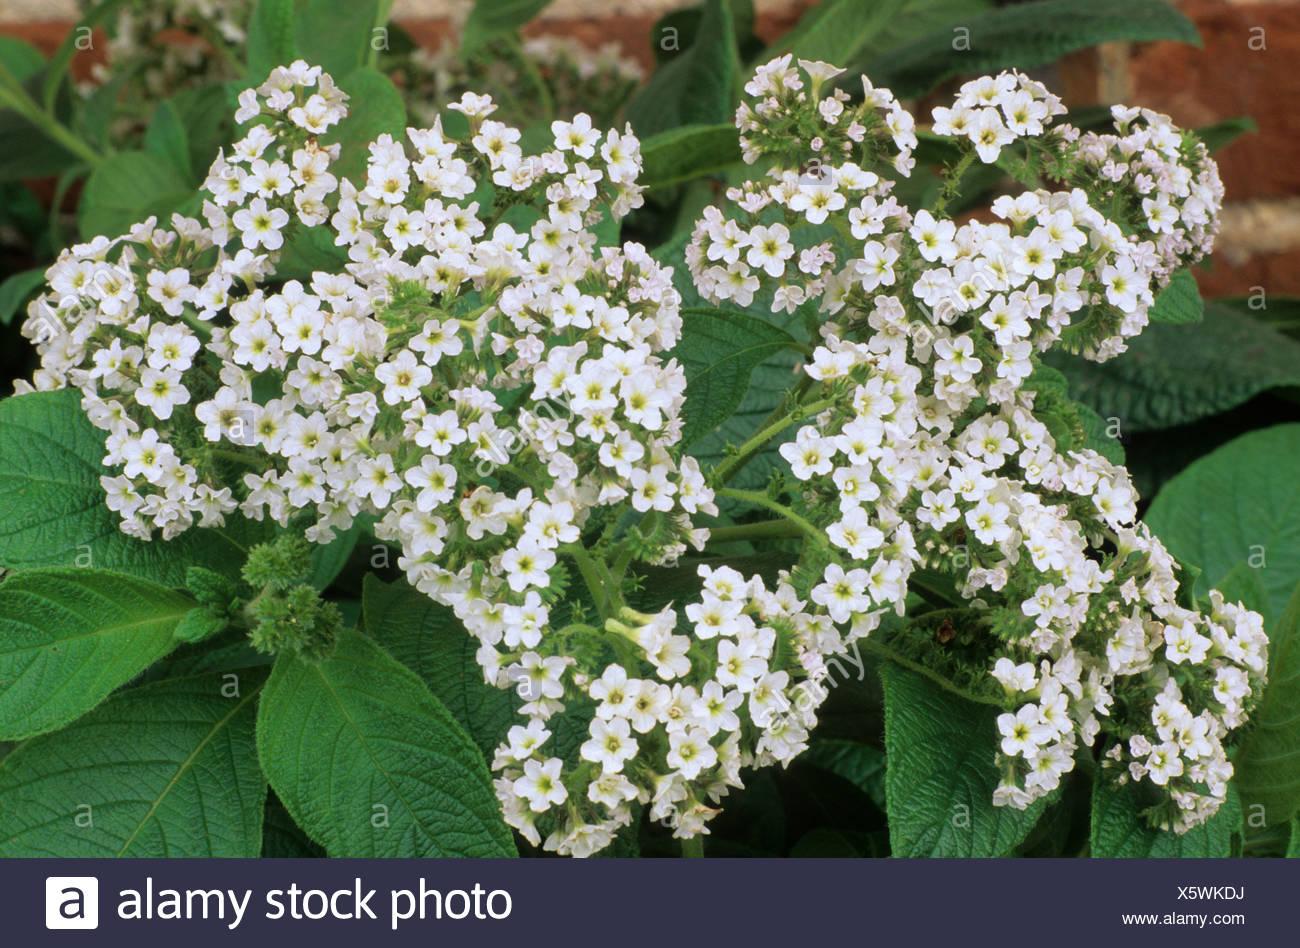 Heliotropium White Lady Heliotrope Heliotropes White Flower